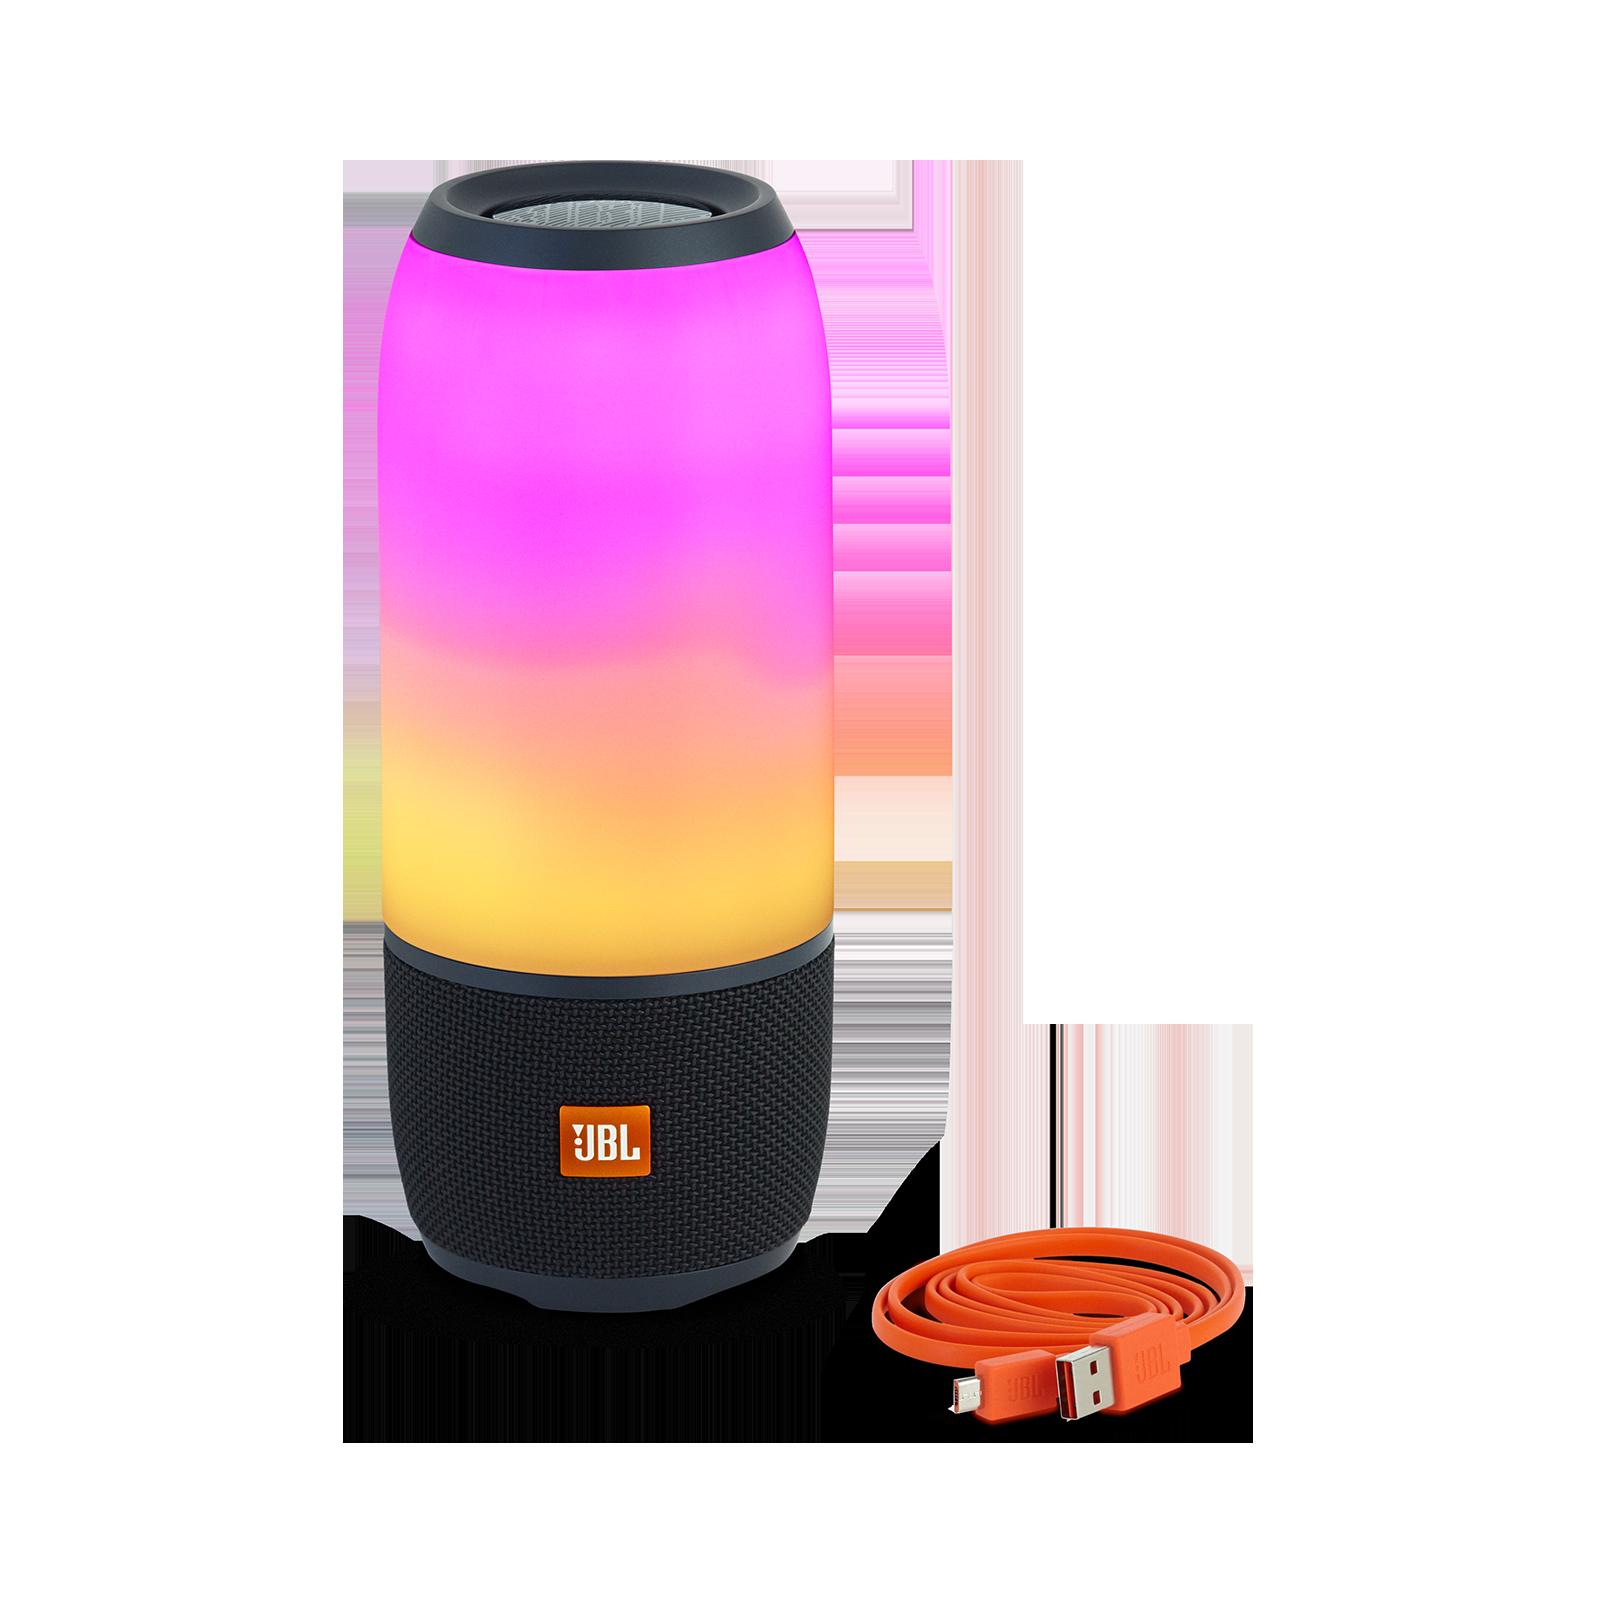 jbl pulse 3 waterproof bluetooth speaker with 360 lightshow. Black Bedroom Furniture Sets. Home Design Ideas